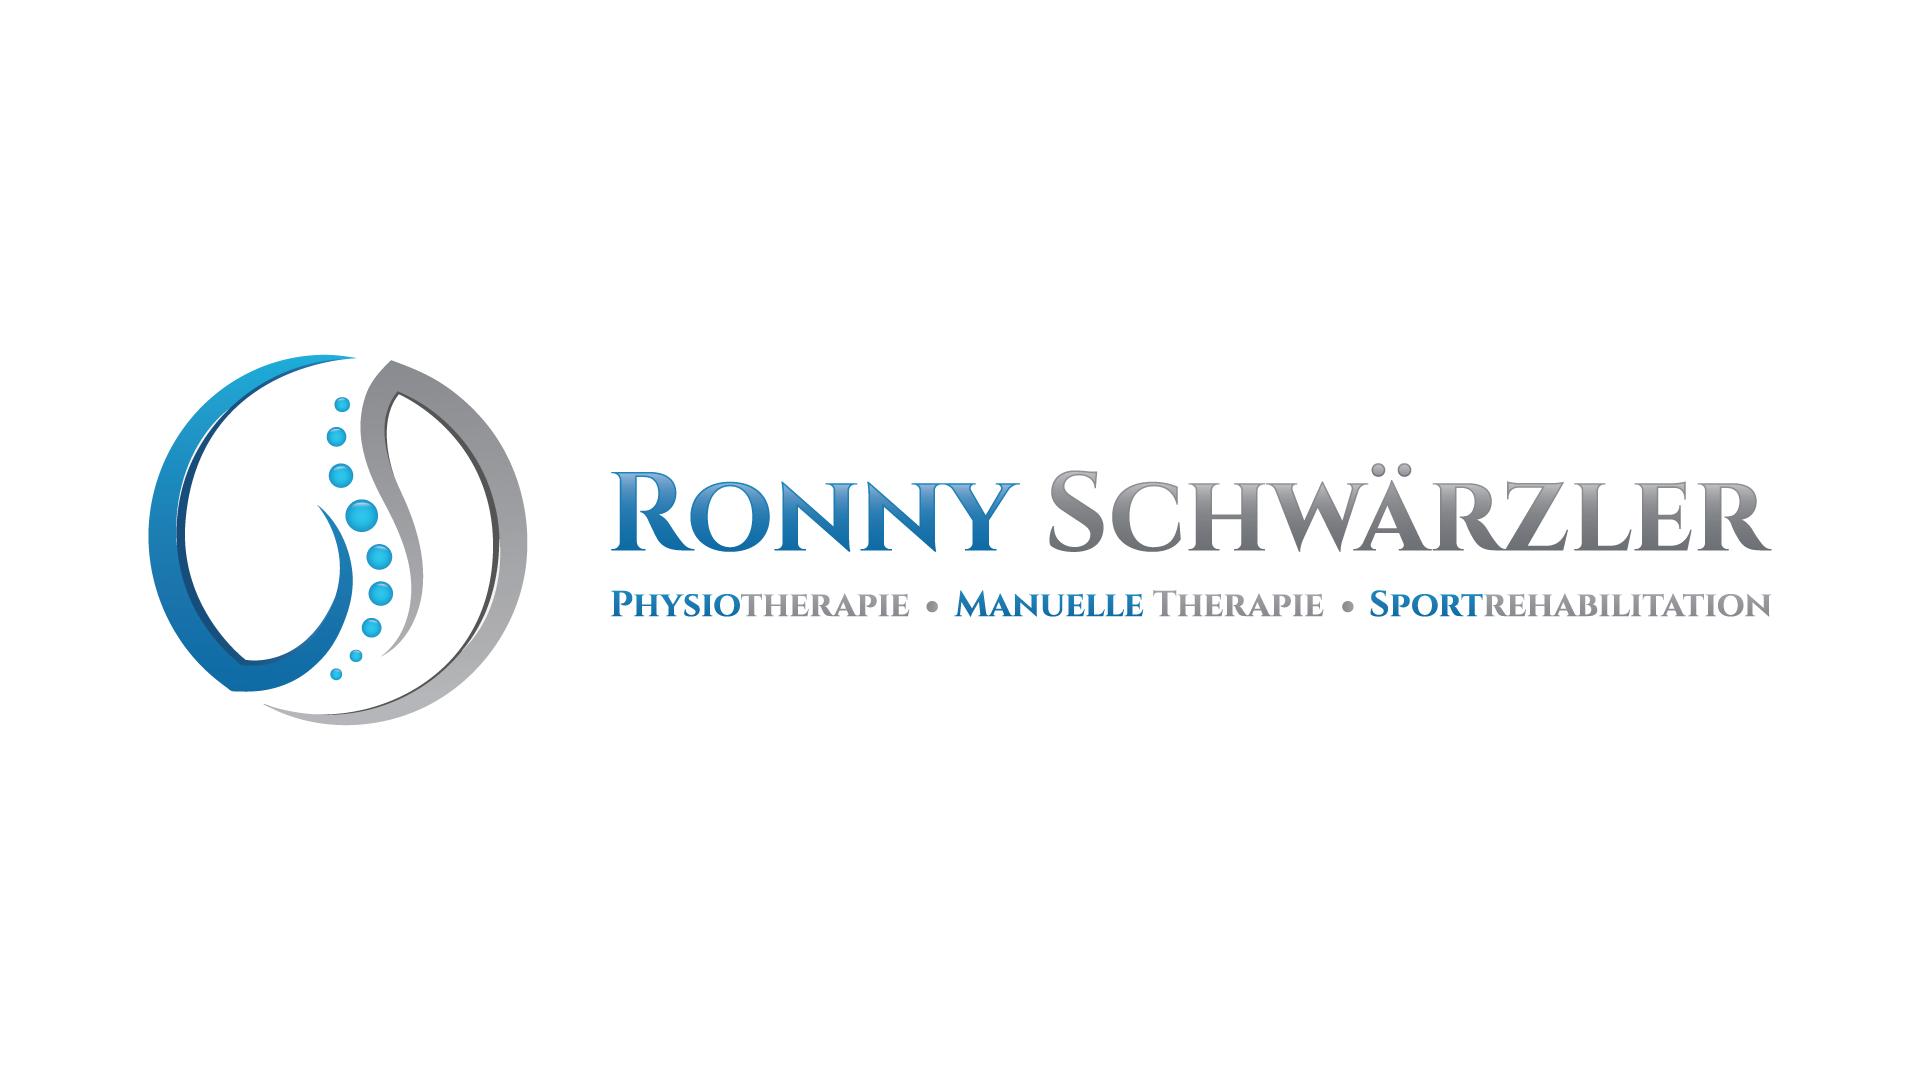 Ronny-Schwaerzler-Logo-Horizontal 5png